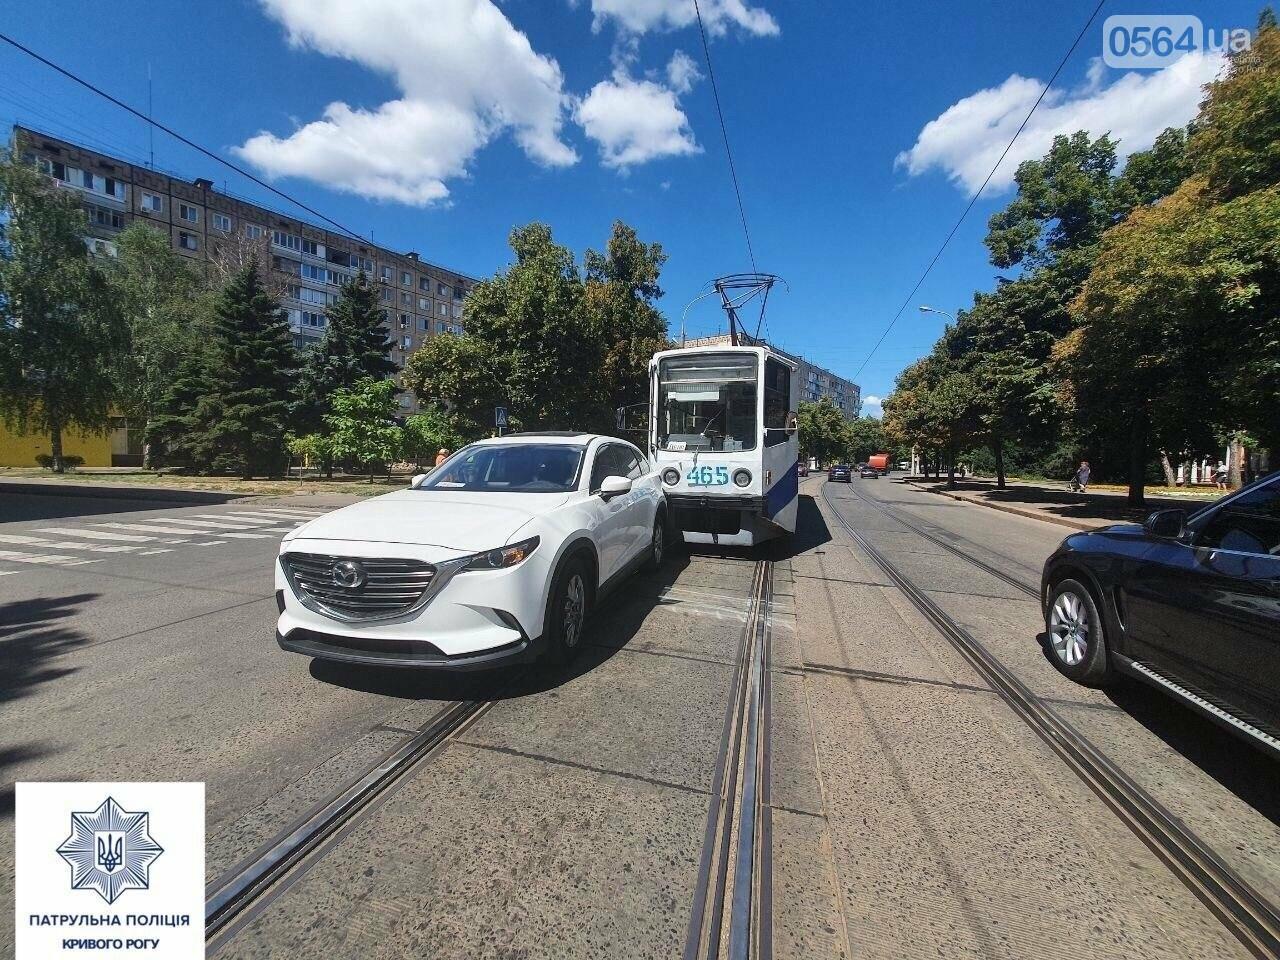 В Кривом Роге дорогу не поделили Mazda cx-9 и трамвай, - ФОТО , фото-1